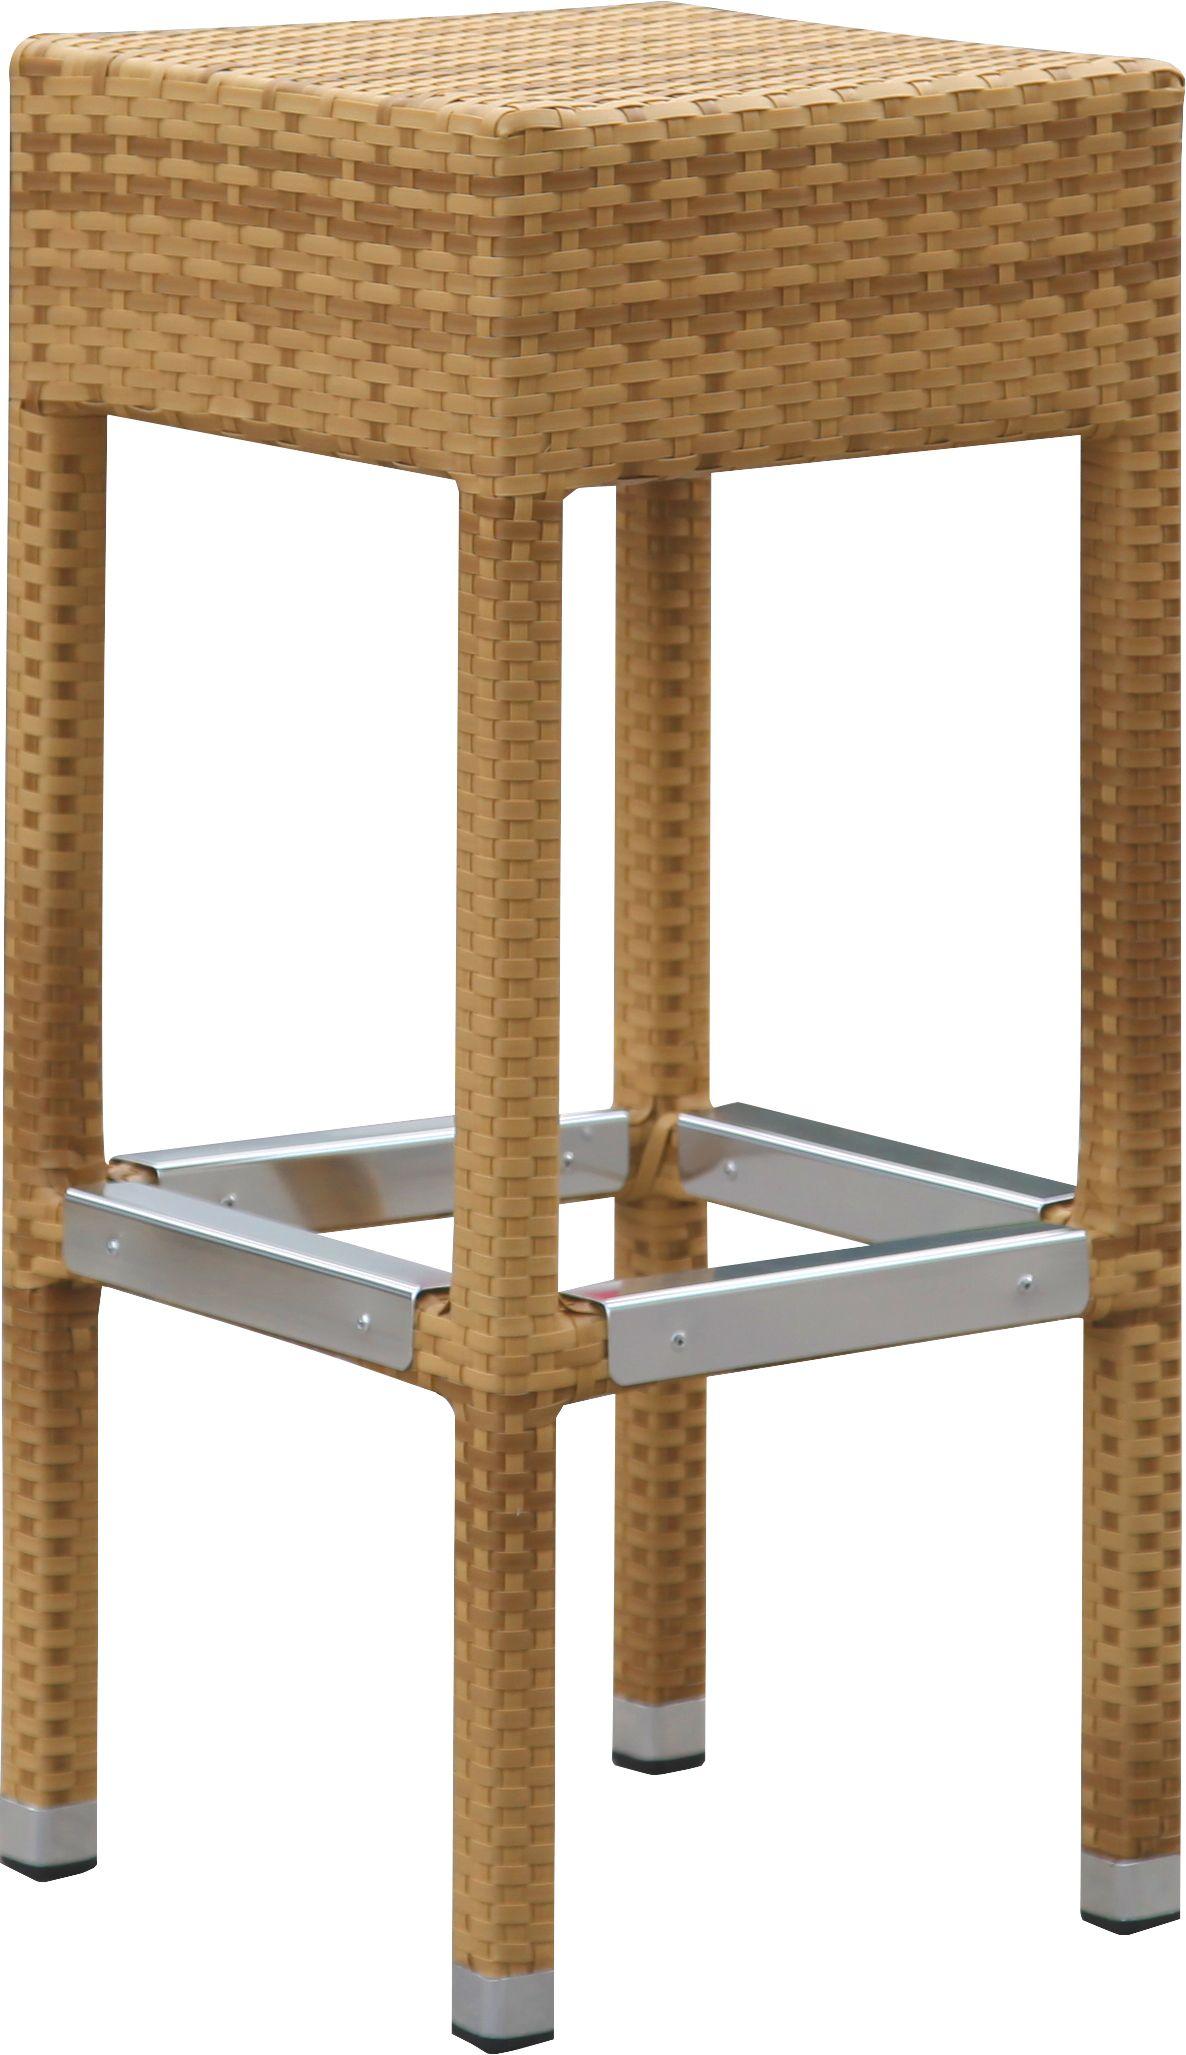 Barhocker Outdoor barhocker outdoor dante 105b sereno möbel